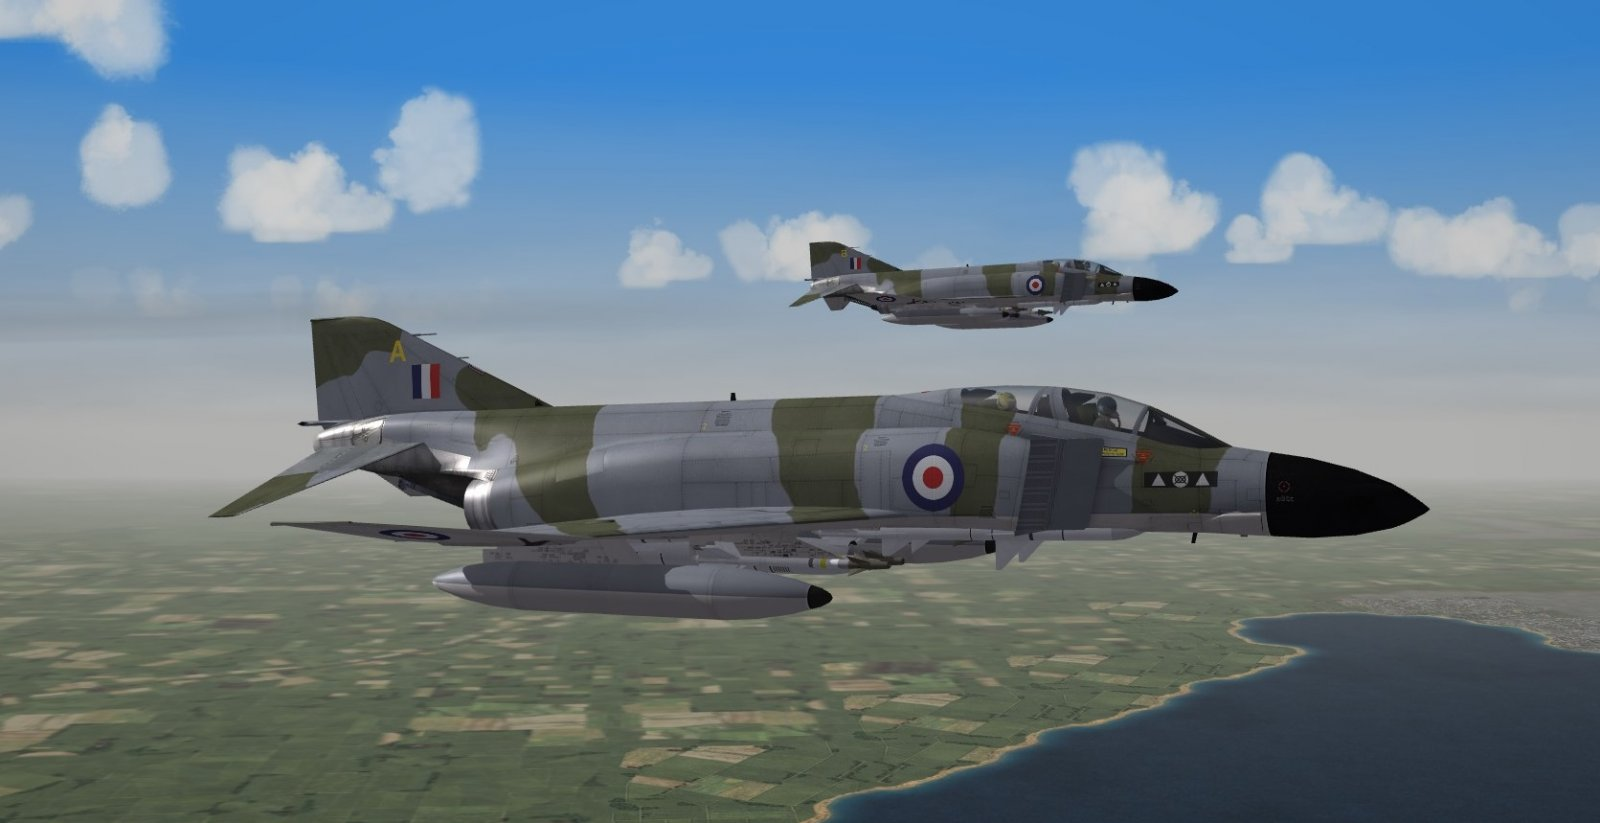 Royal Air Force Phantom FGR2 (F4M) early 1970s